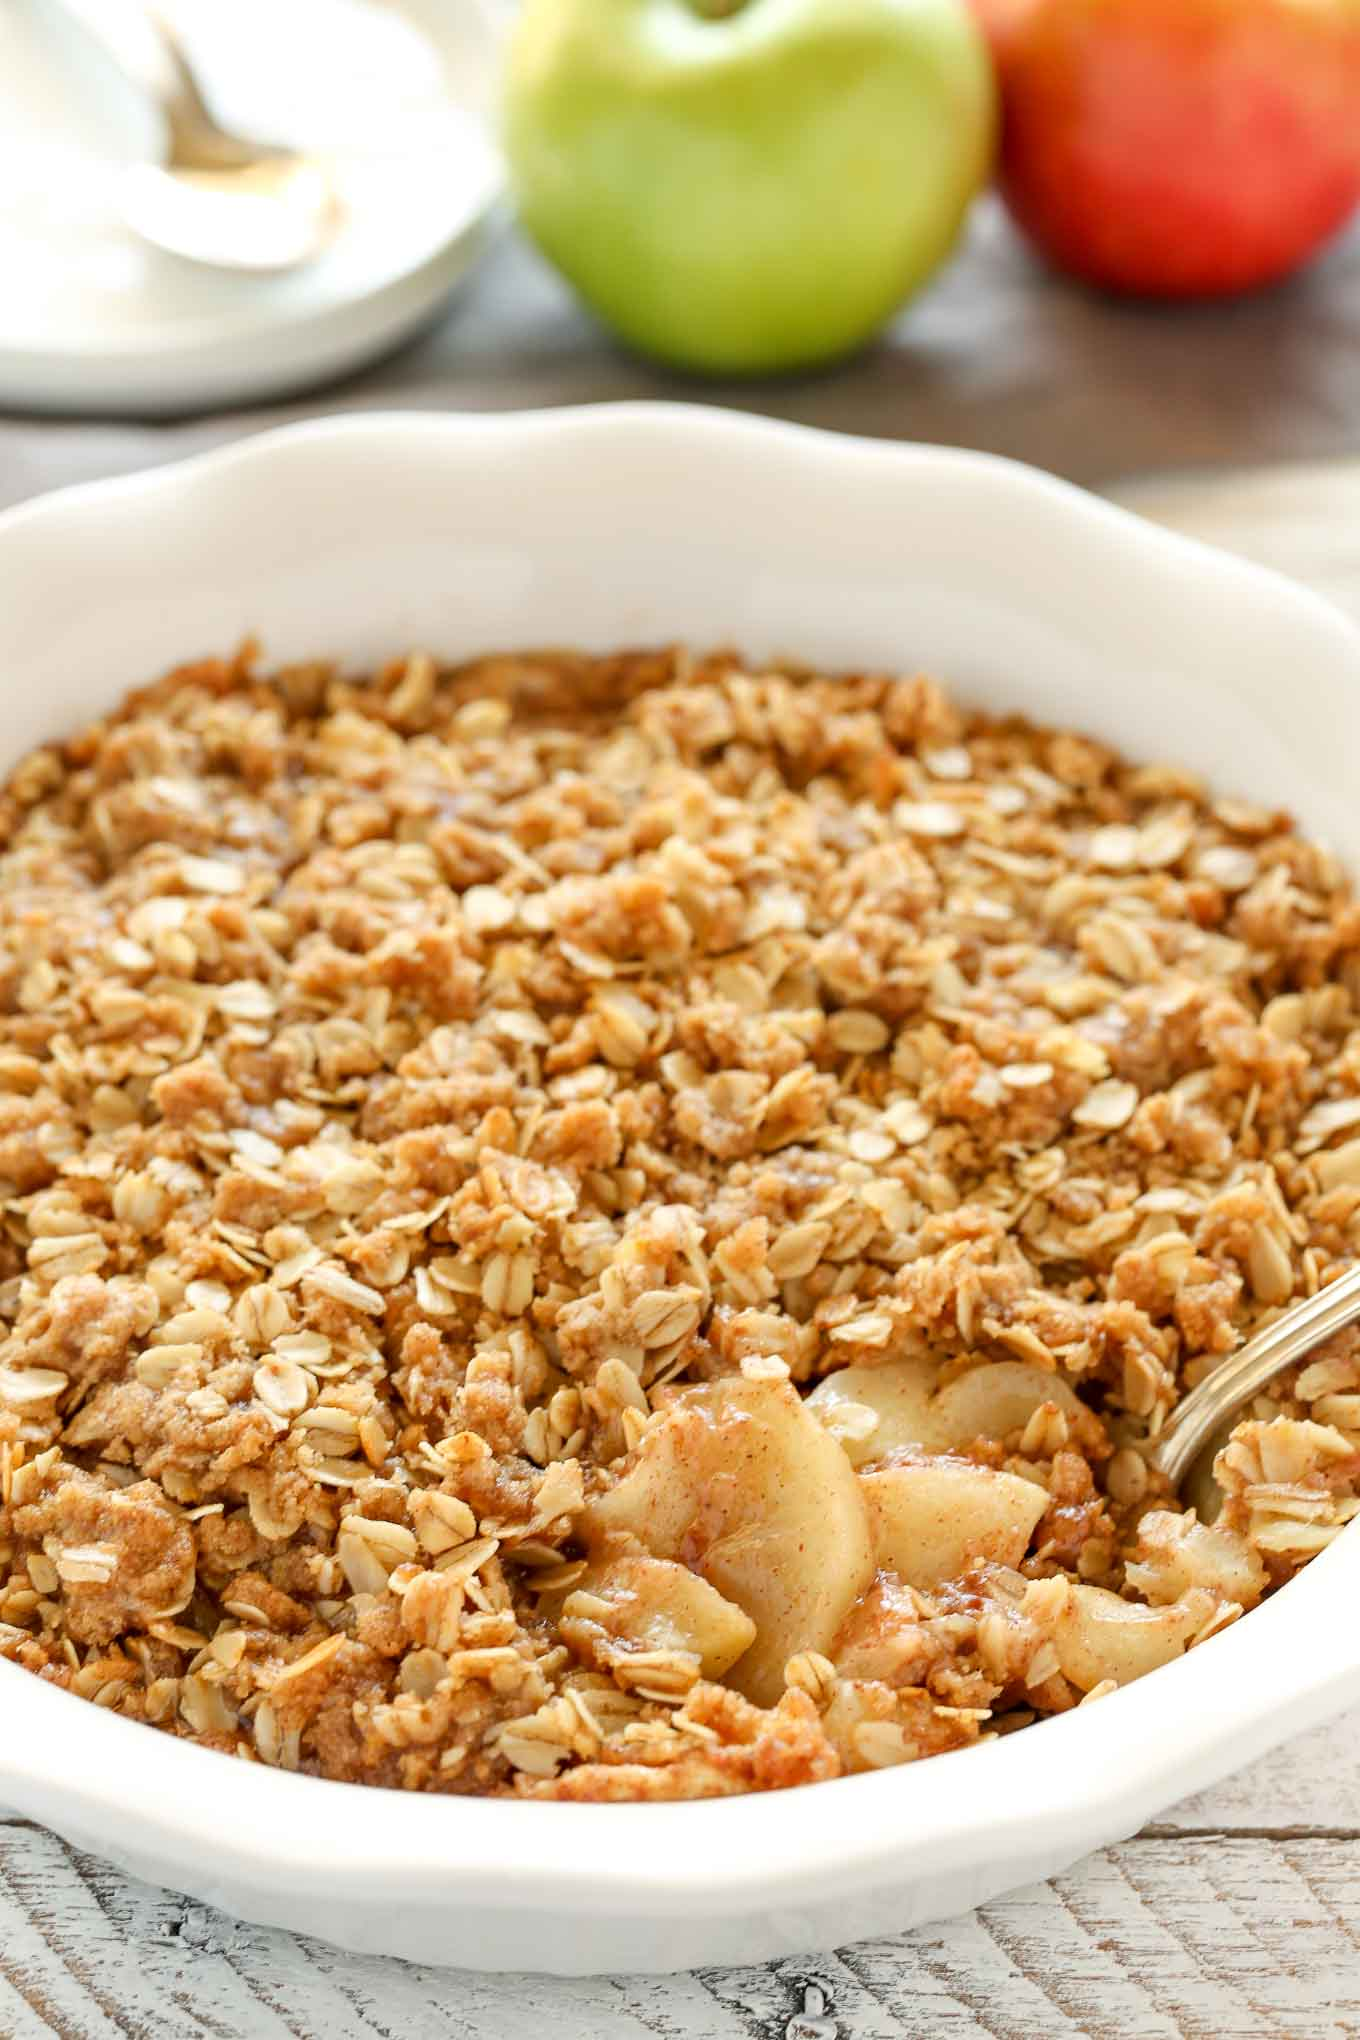 Apple Crisp Dessert Recipes